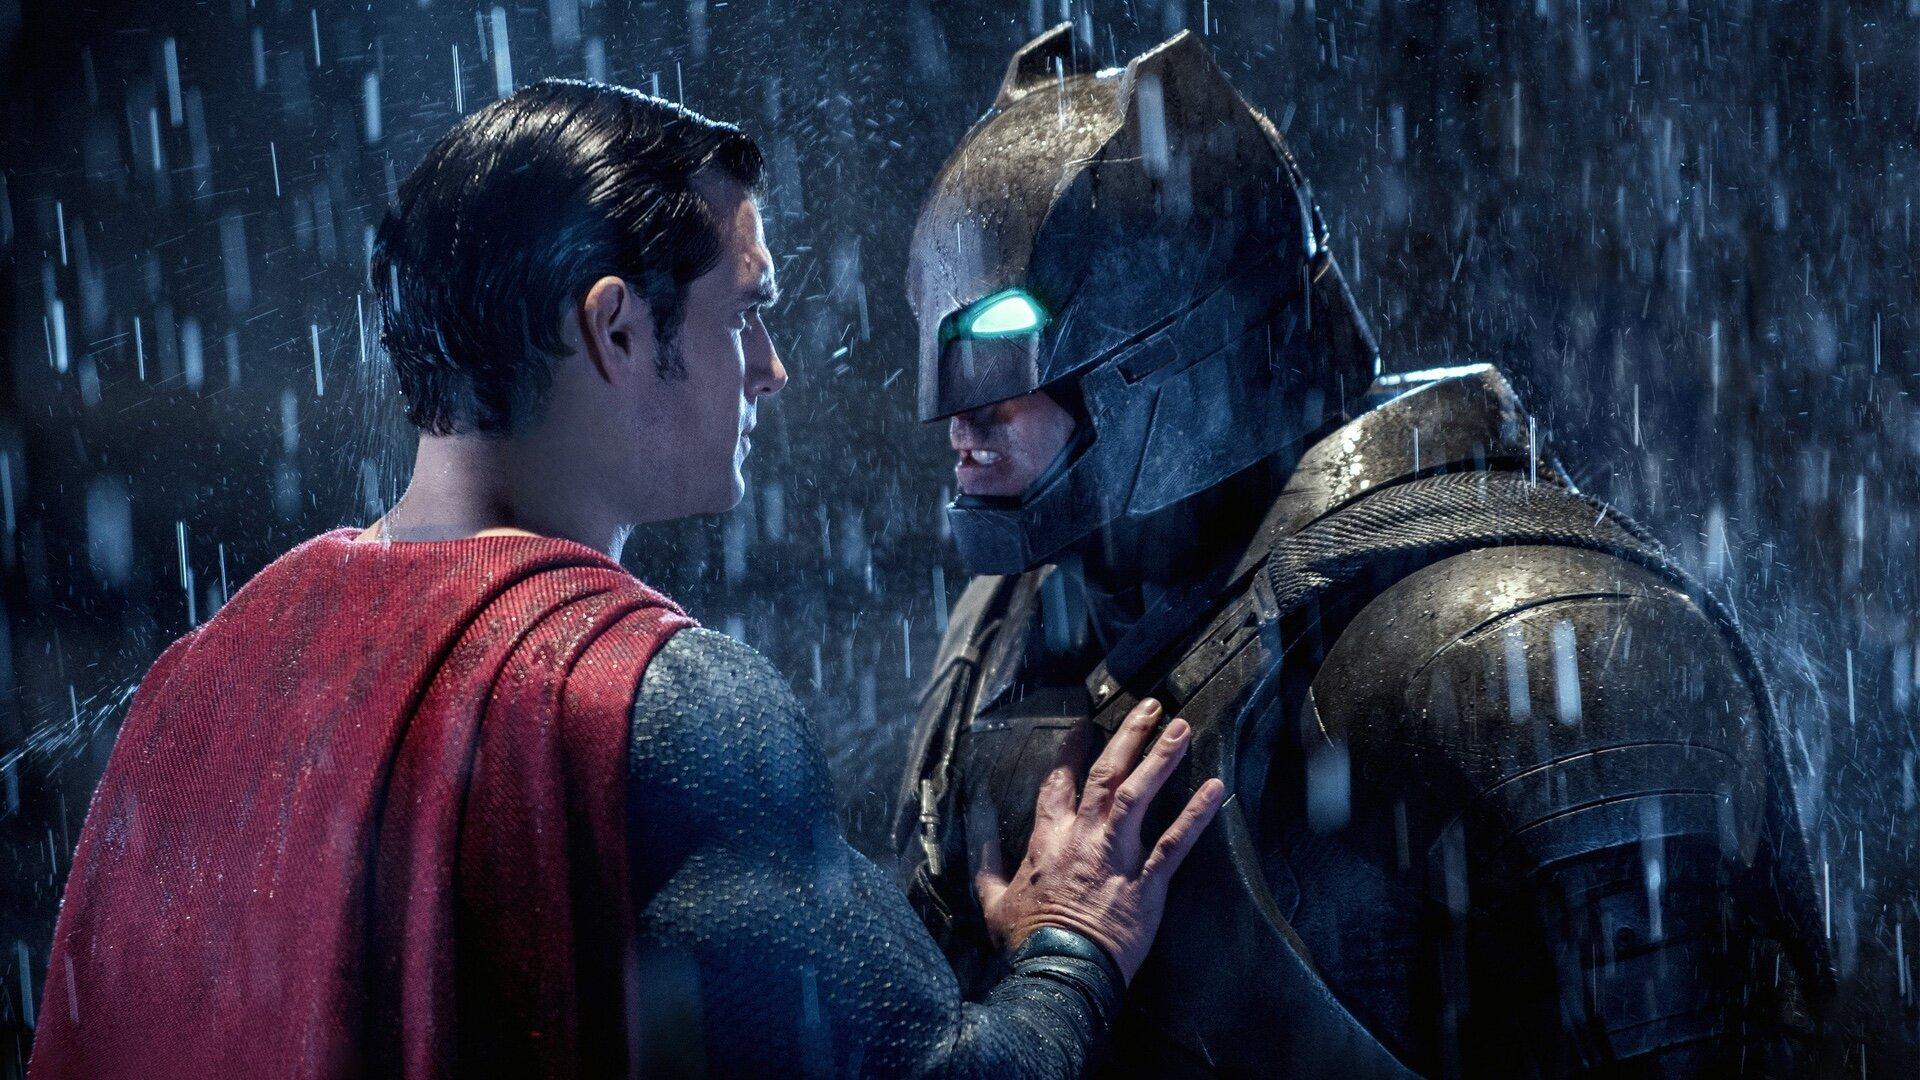 Zack Snyder Is Releasing A New Version of Batman v Superman